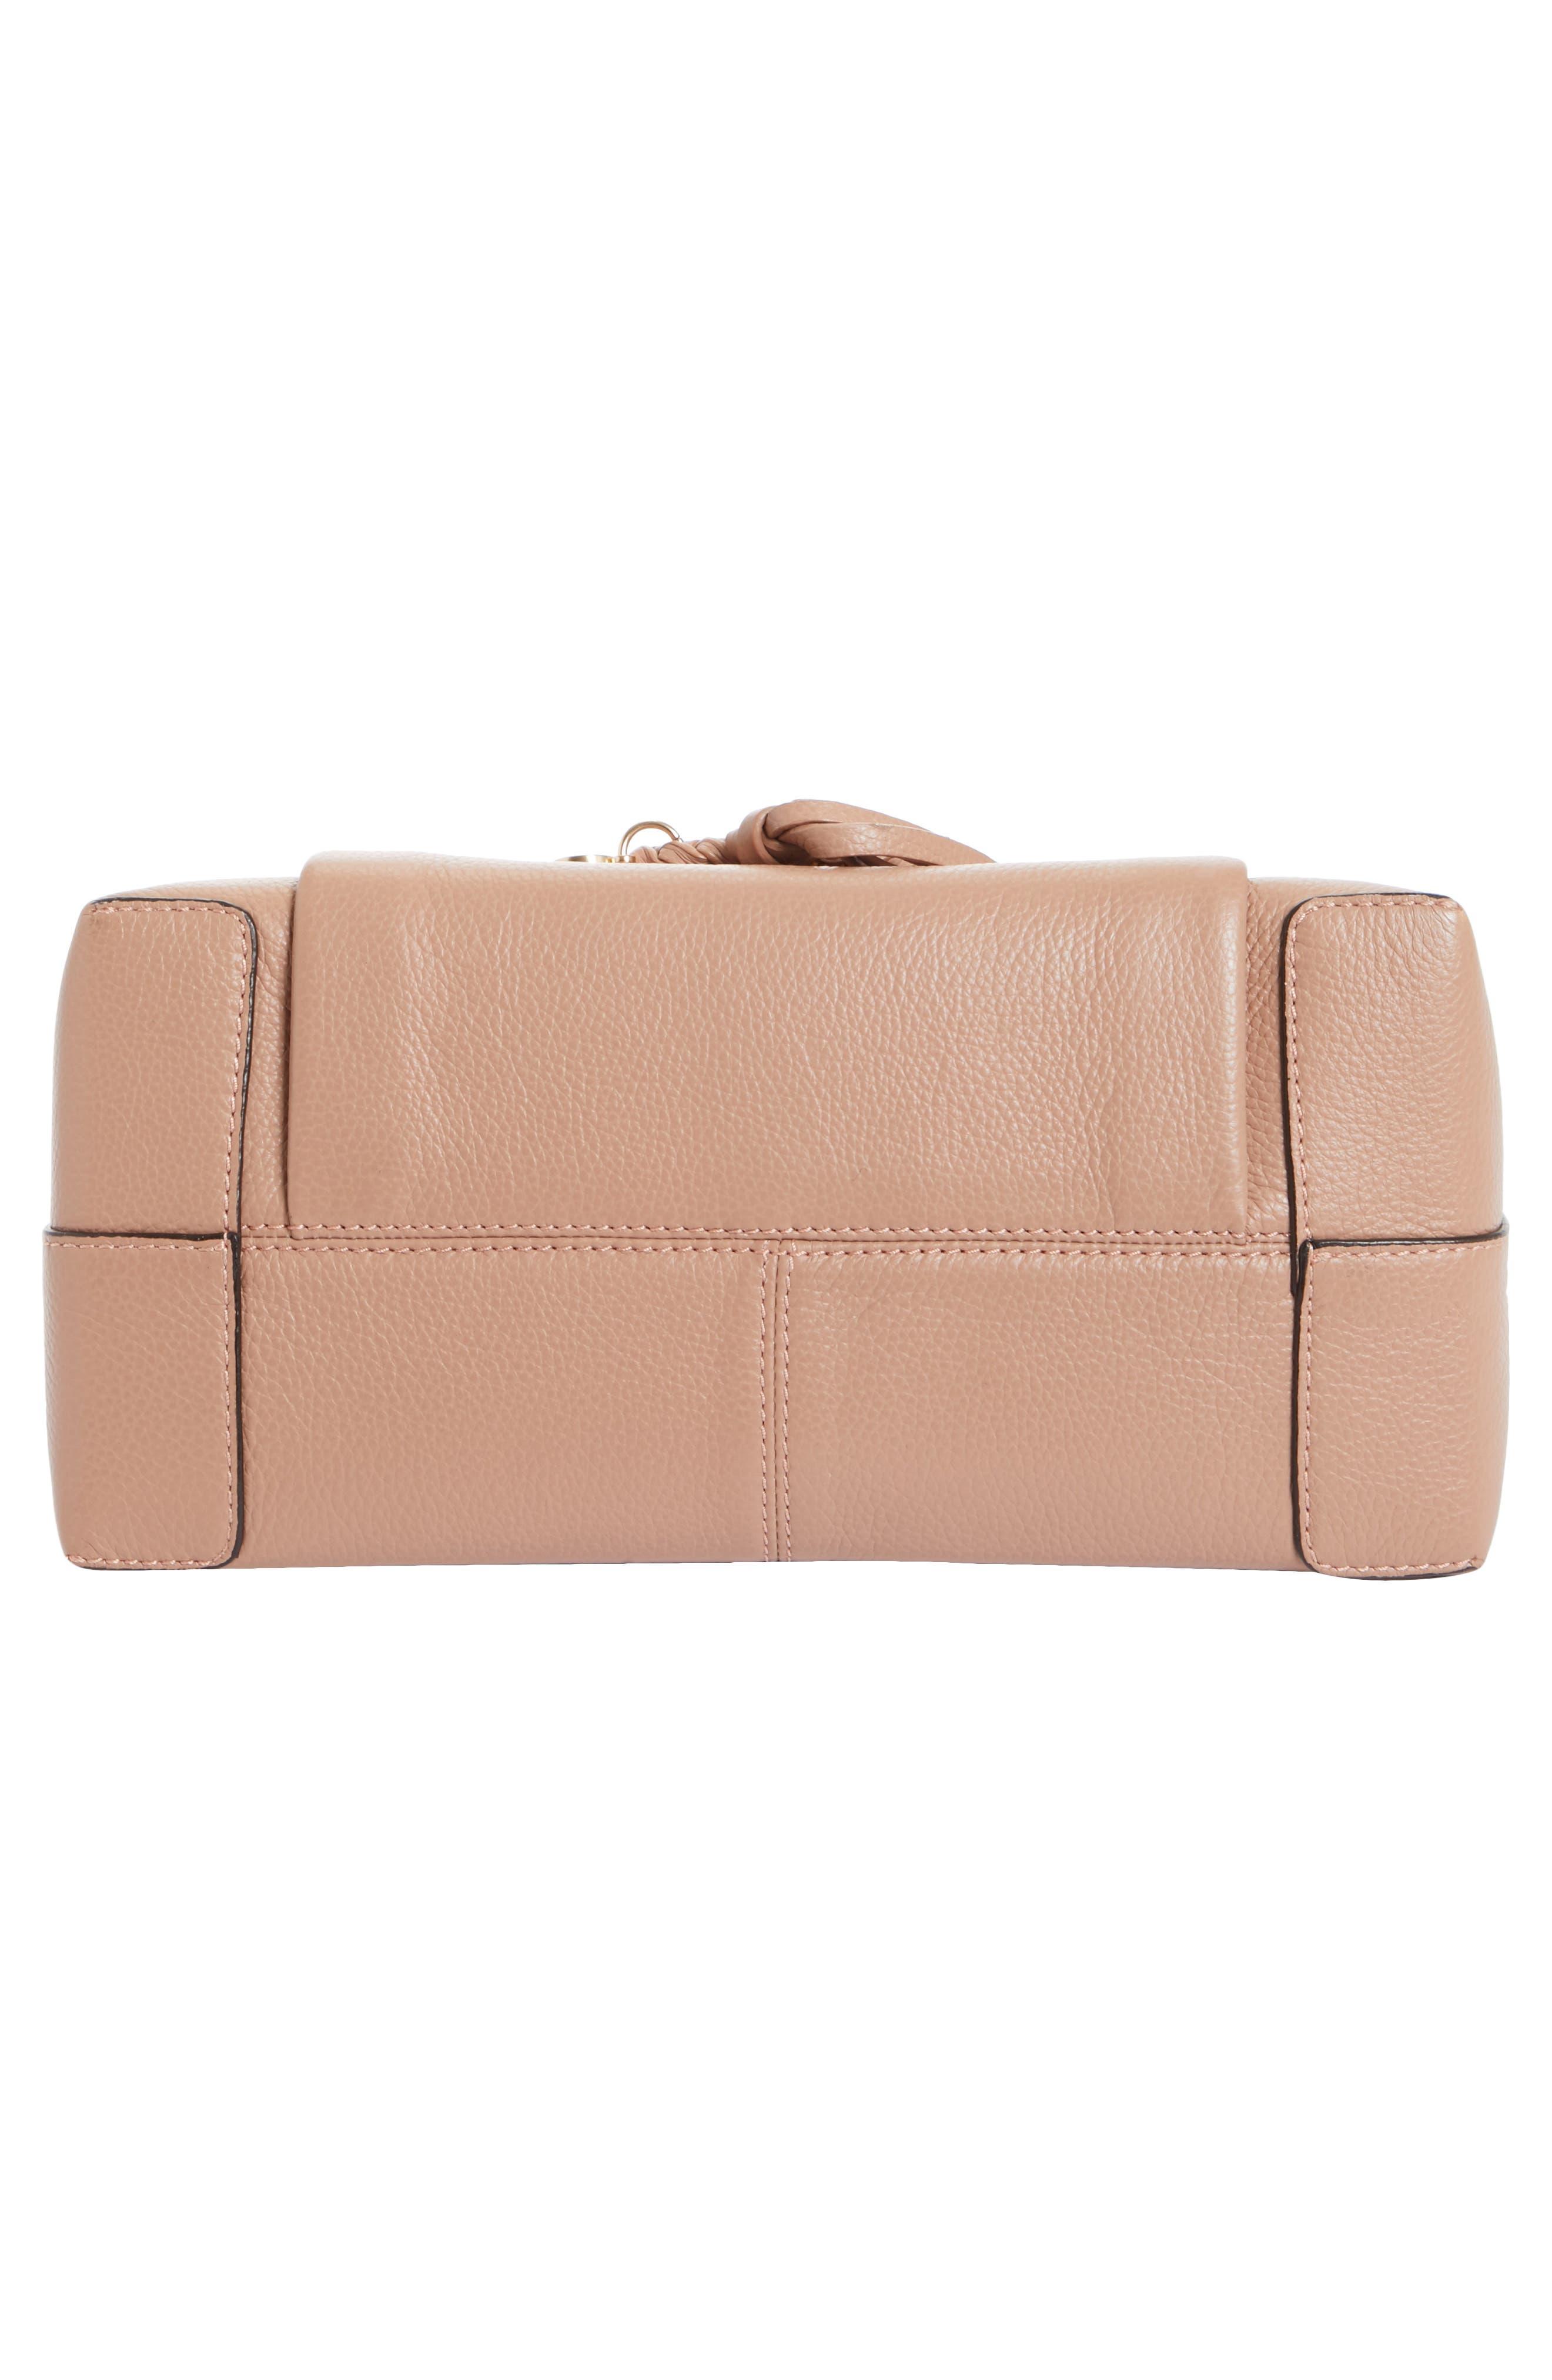 Small Joan Leather Shoulder Bag,                             Alternate thumbnail 6, color,                             650